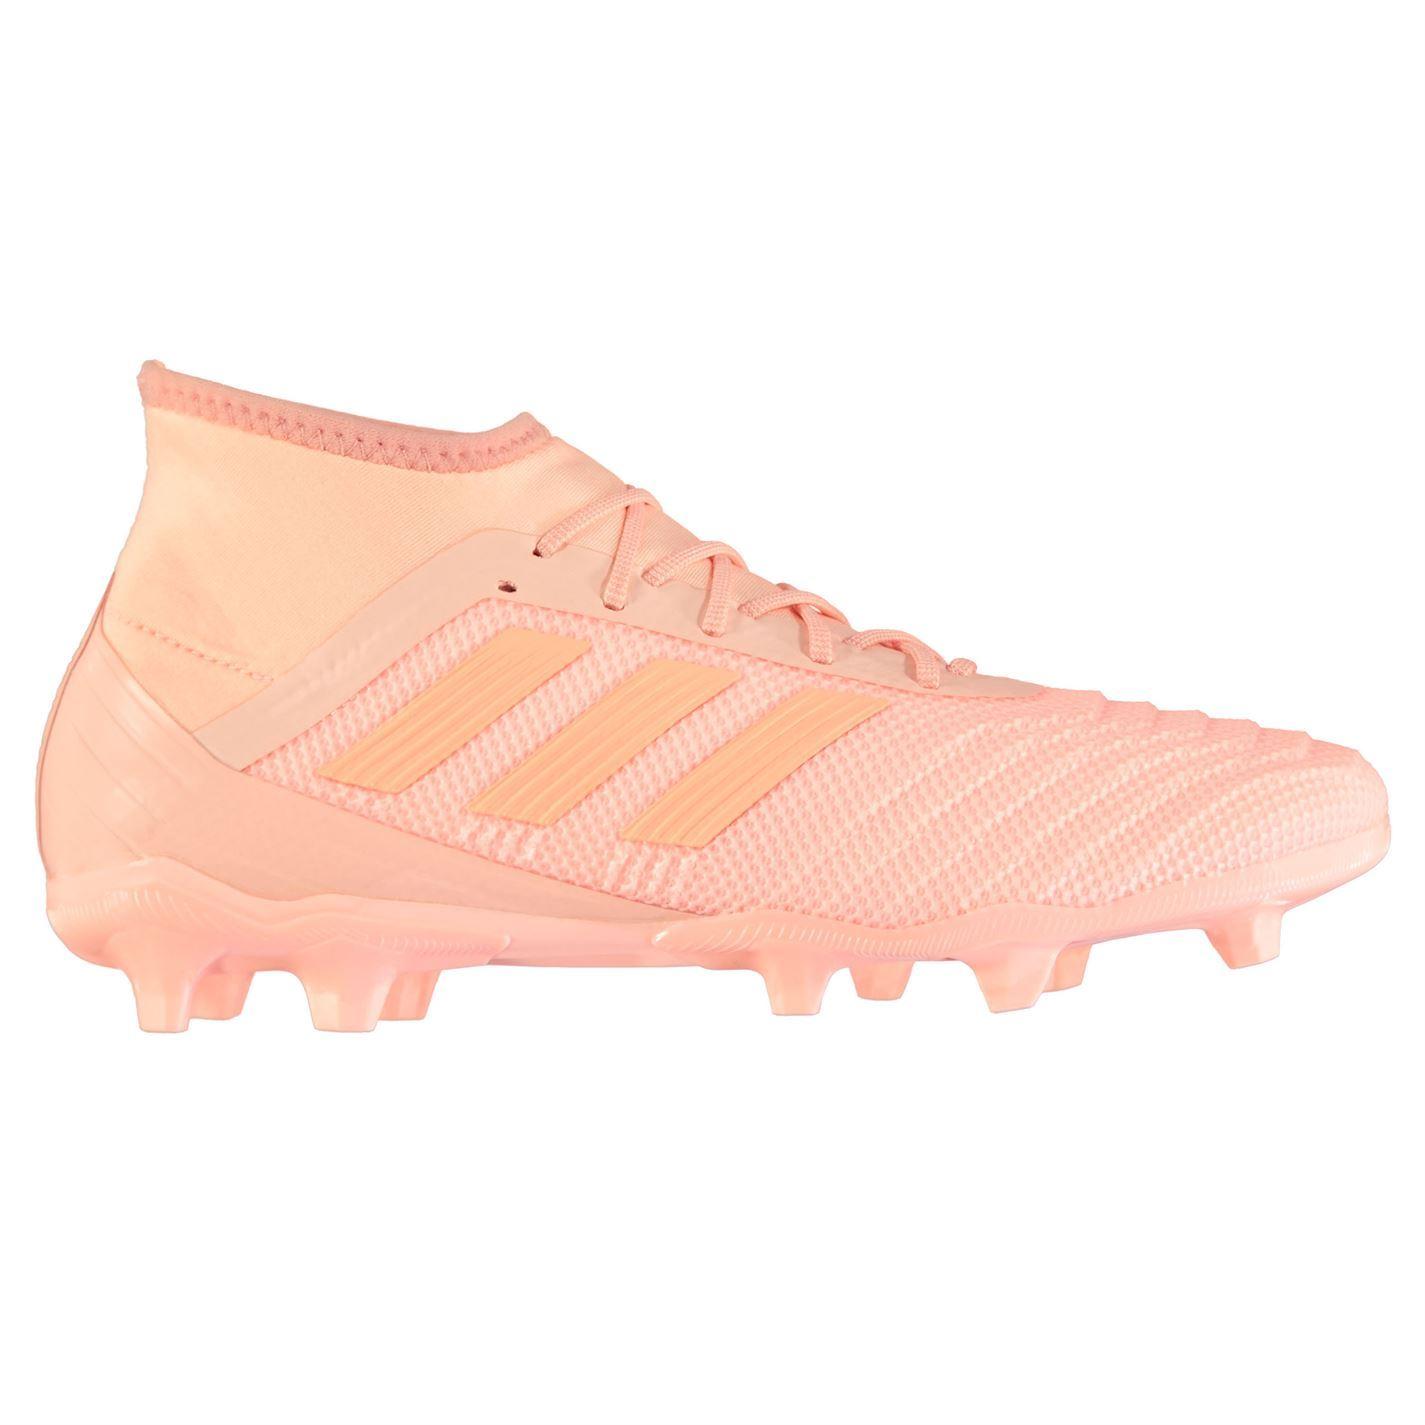 Adidas-Predator-18-2-FG-Firm-Ground-Chaussures-De-Football-Homme-Football-Chaussures-Crampons miniature 10